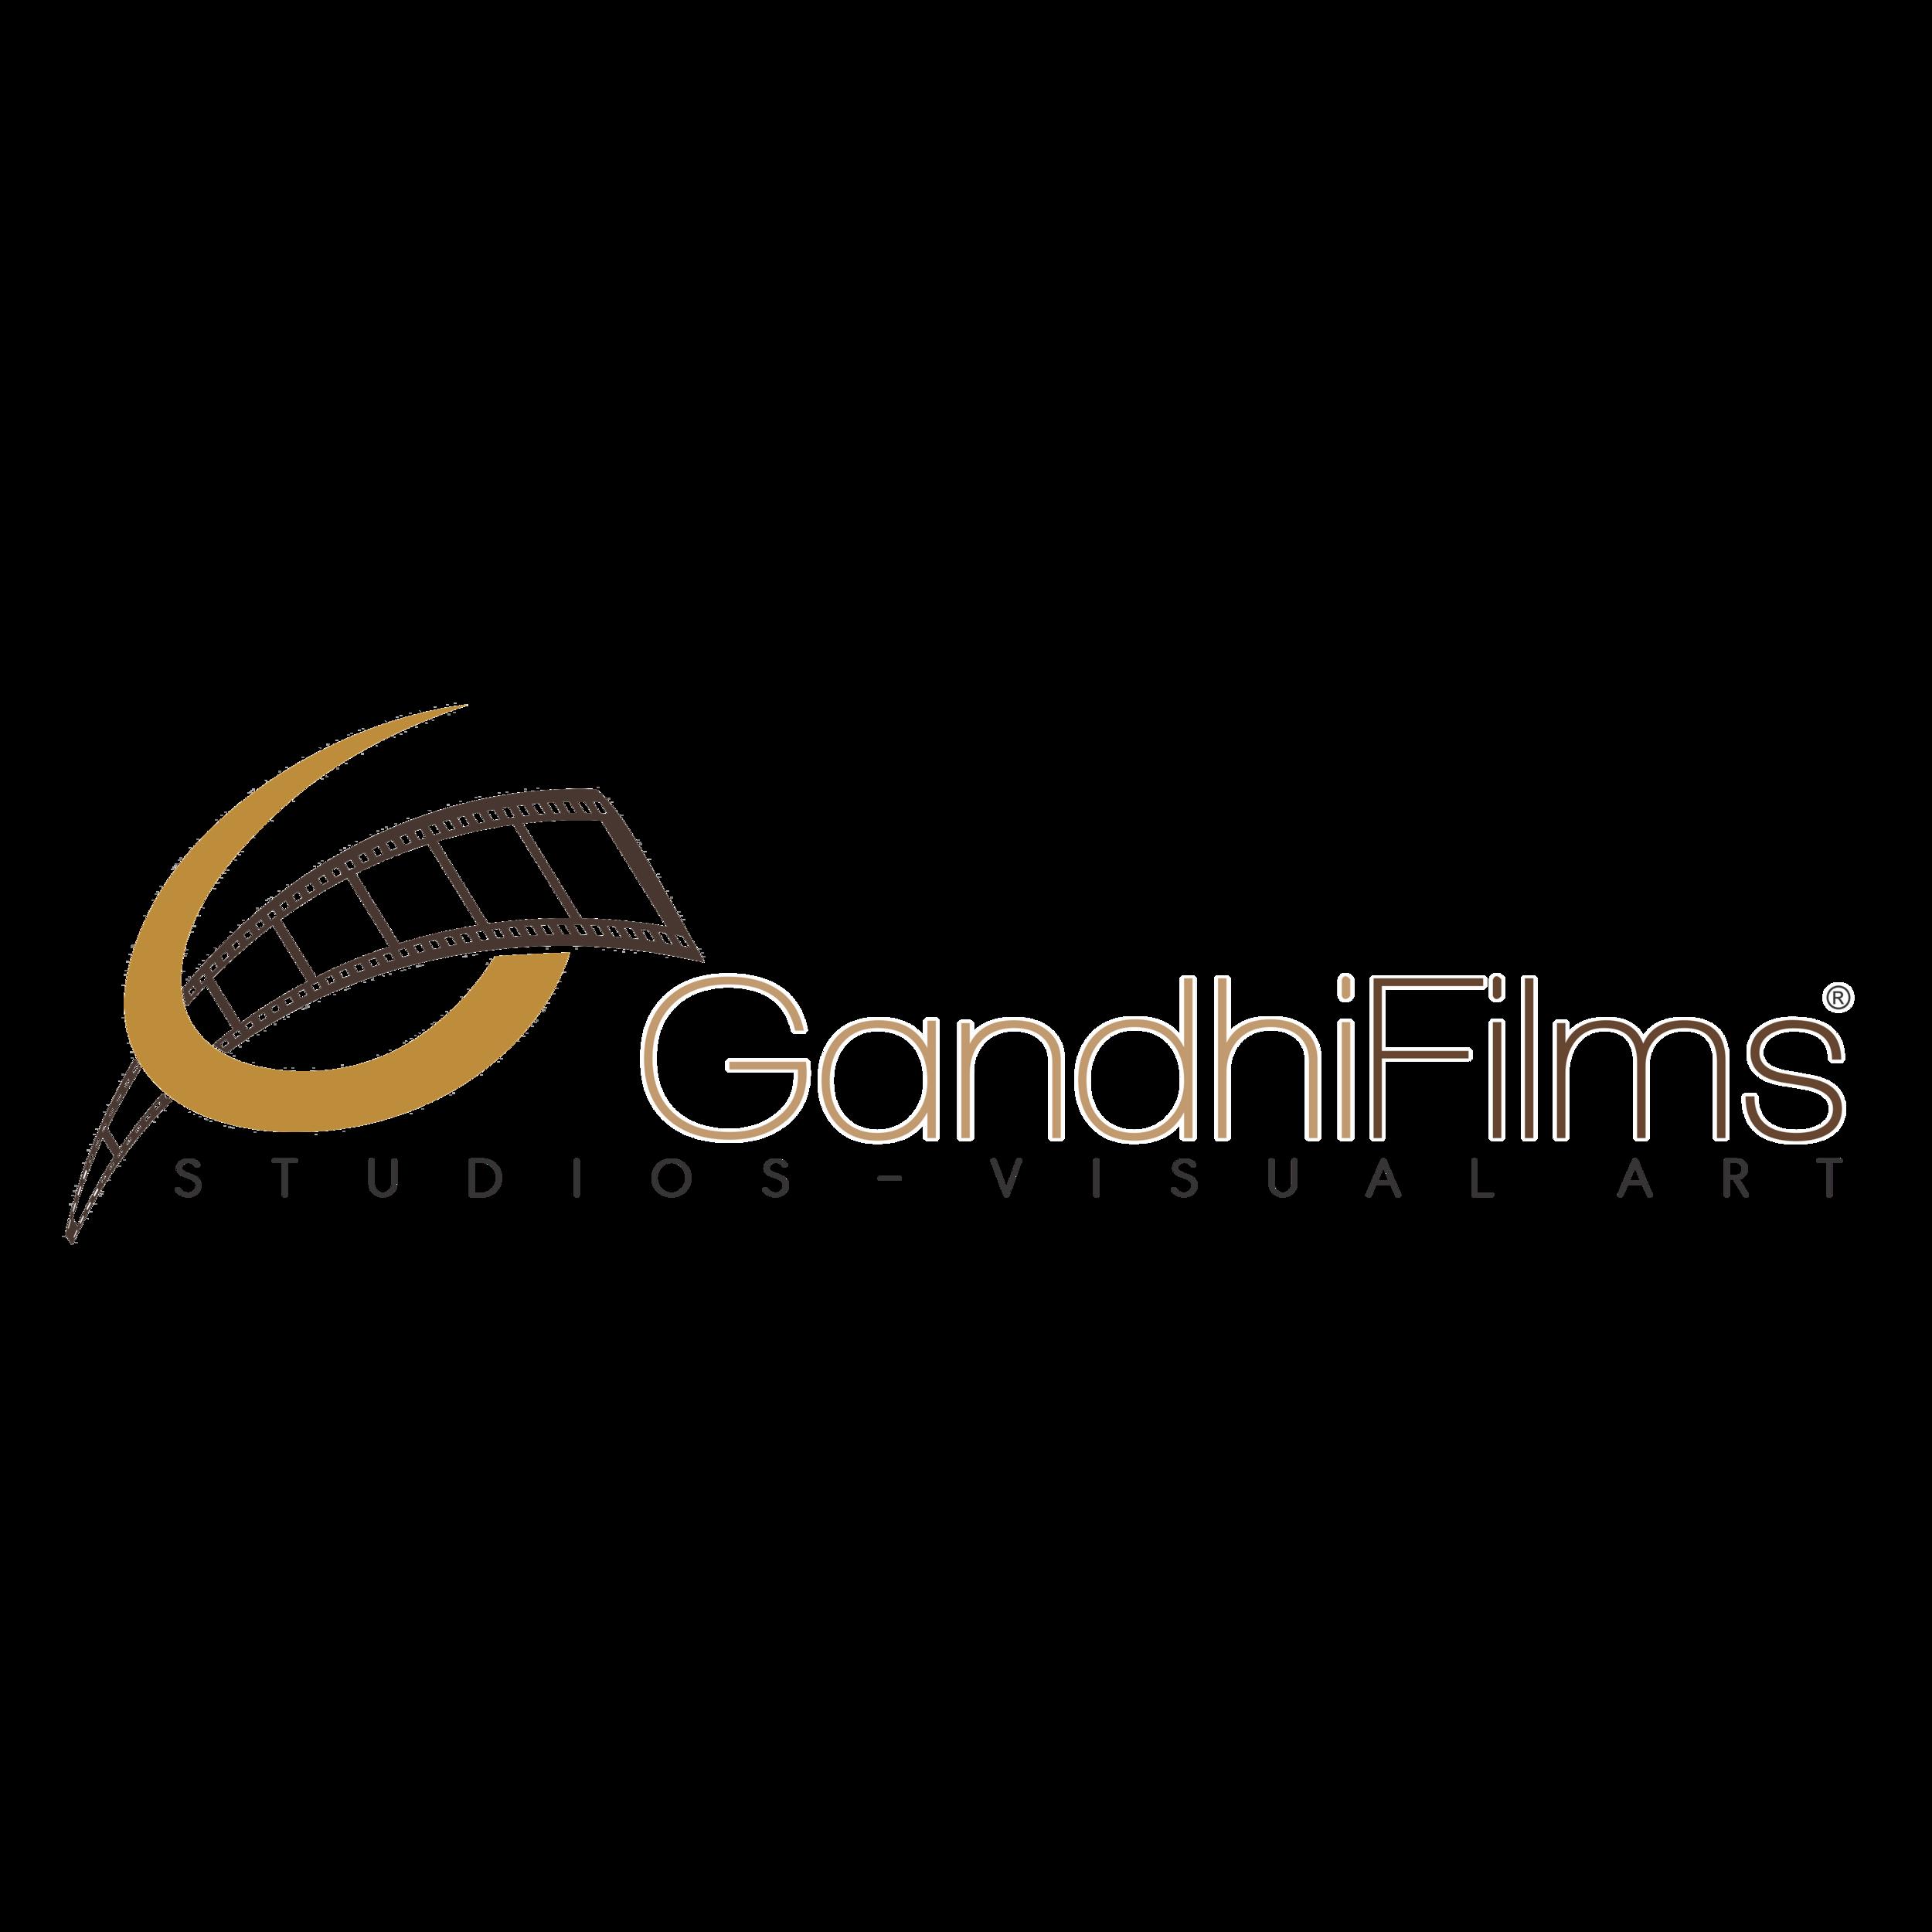 Logotipooo Gandhi Films en png.png